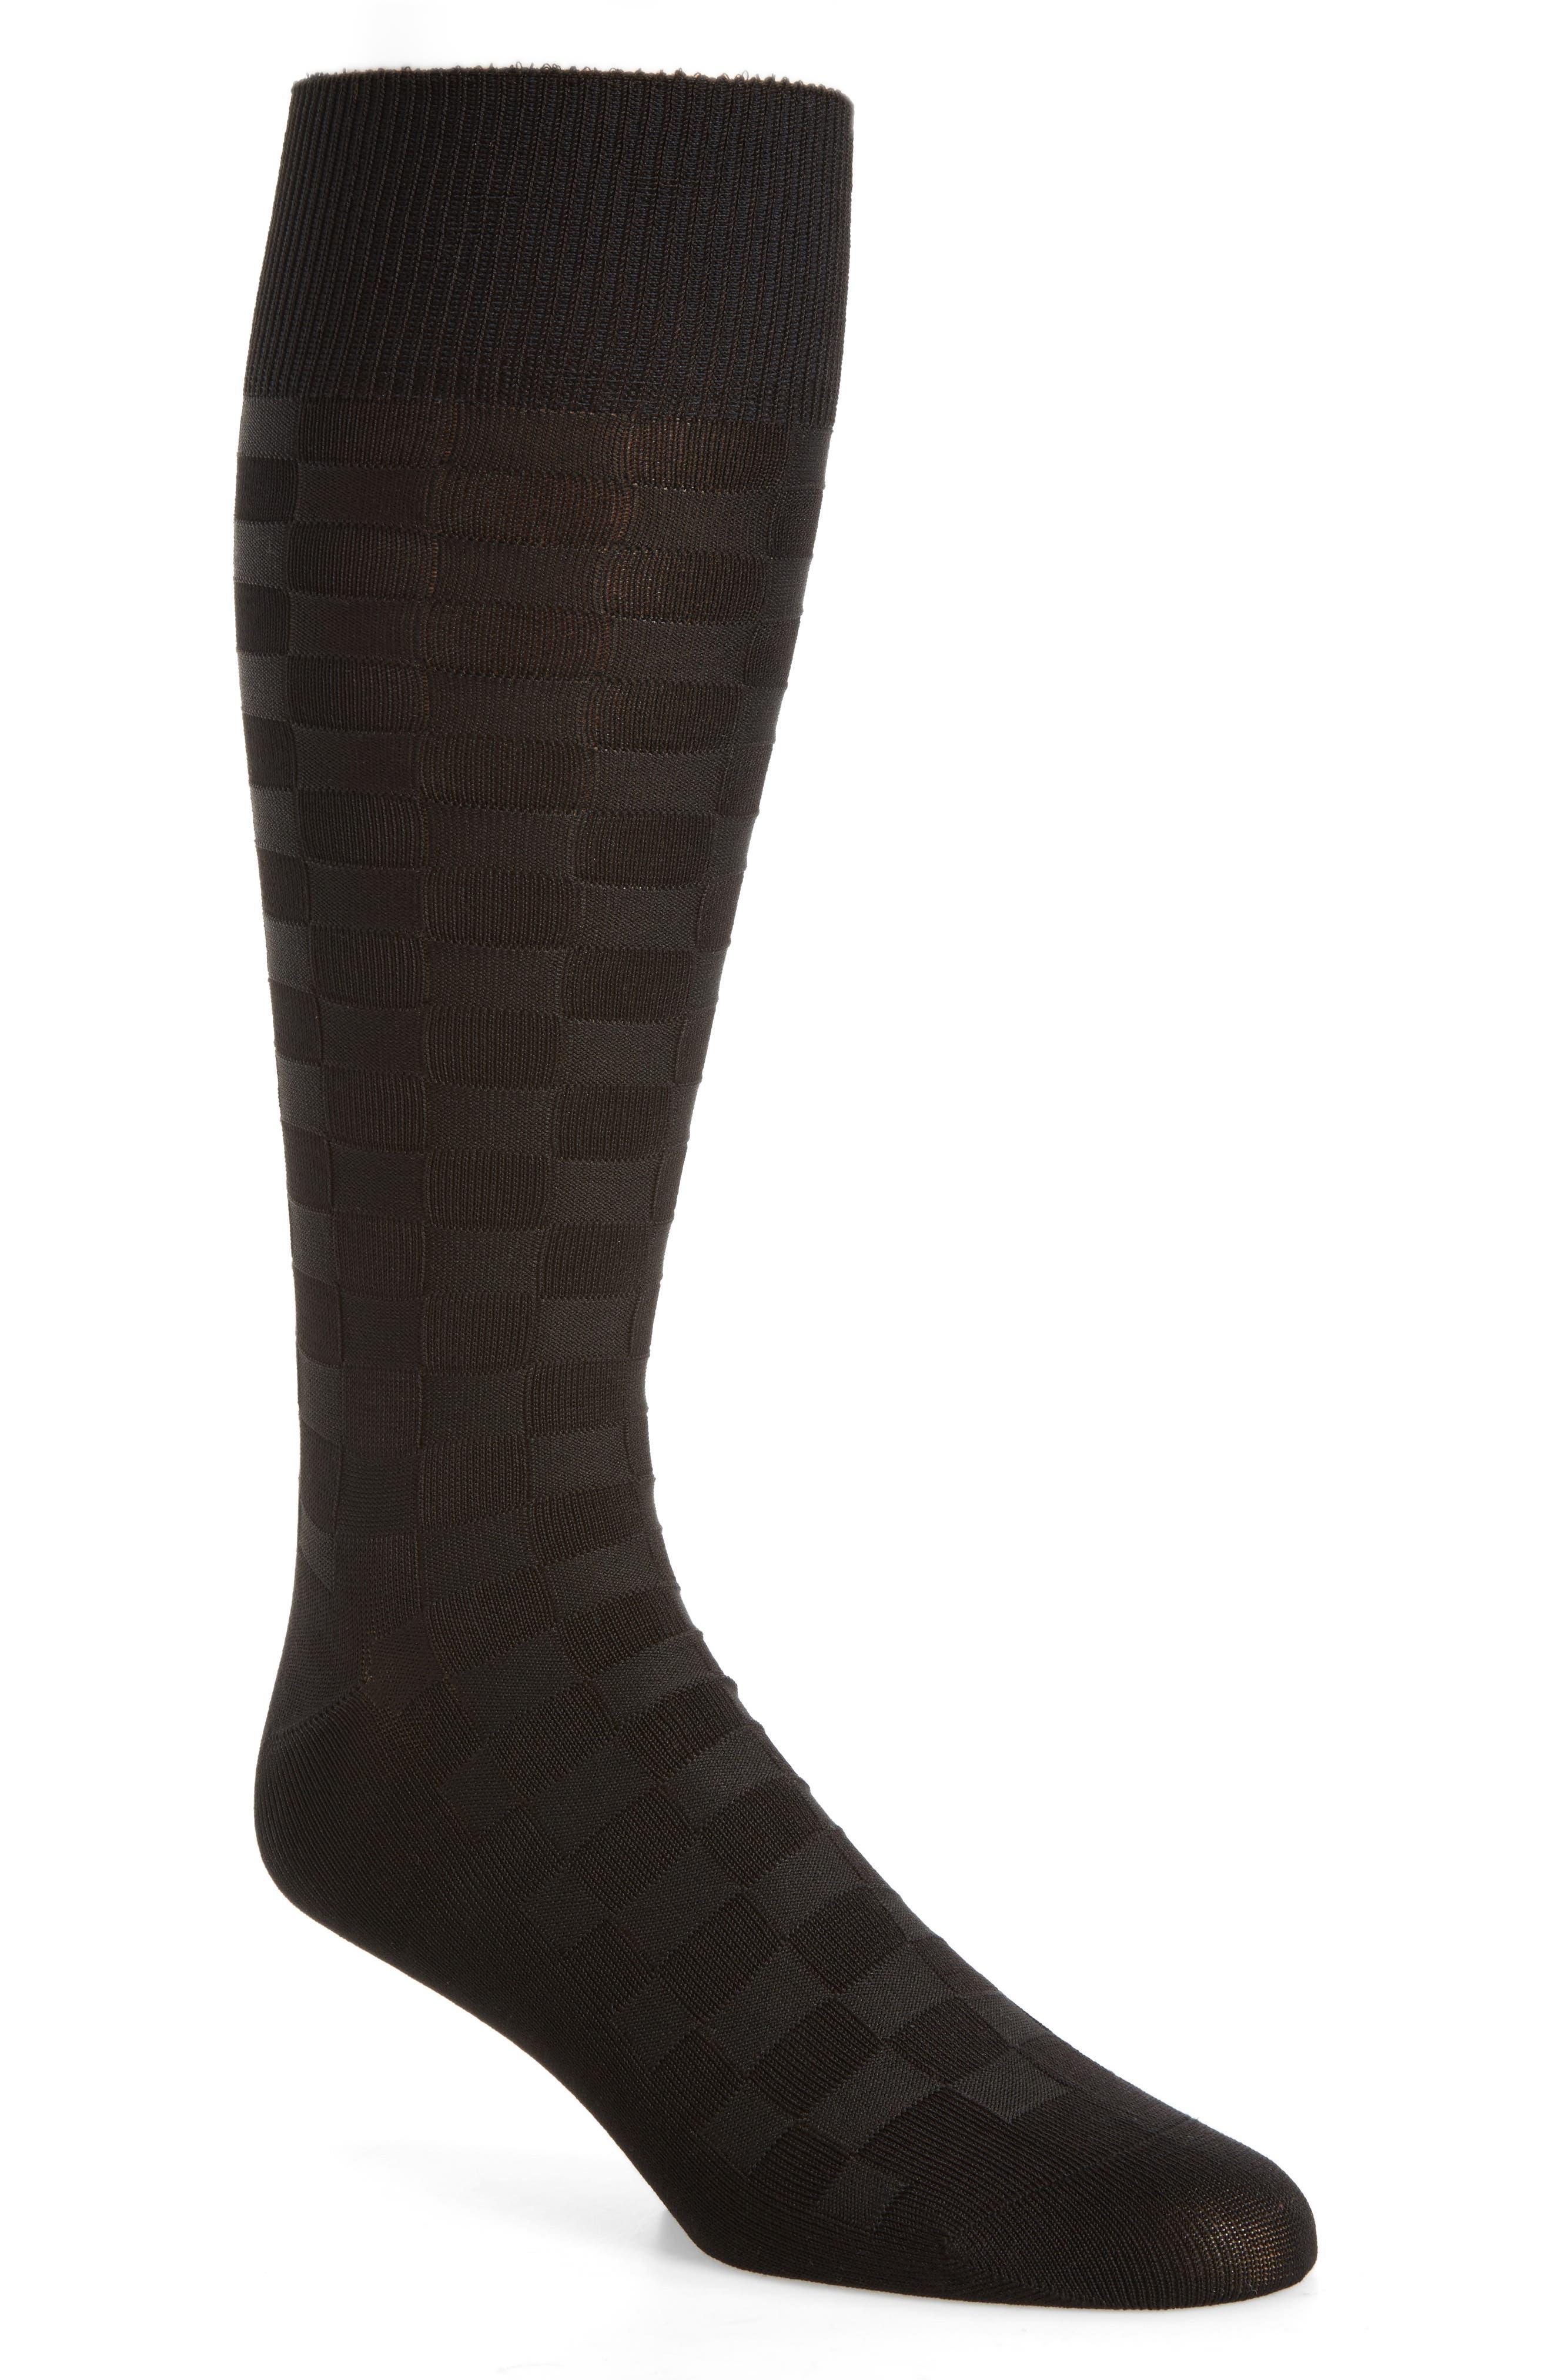 Grid Socks,                             Main thumbnail 1, color,                             Black